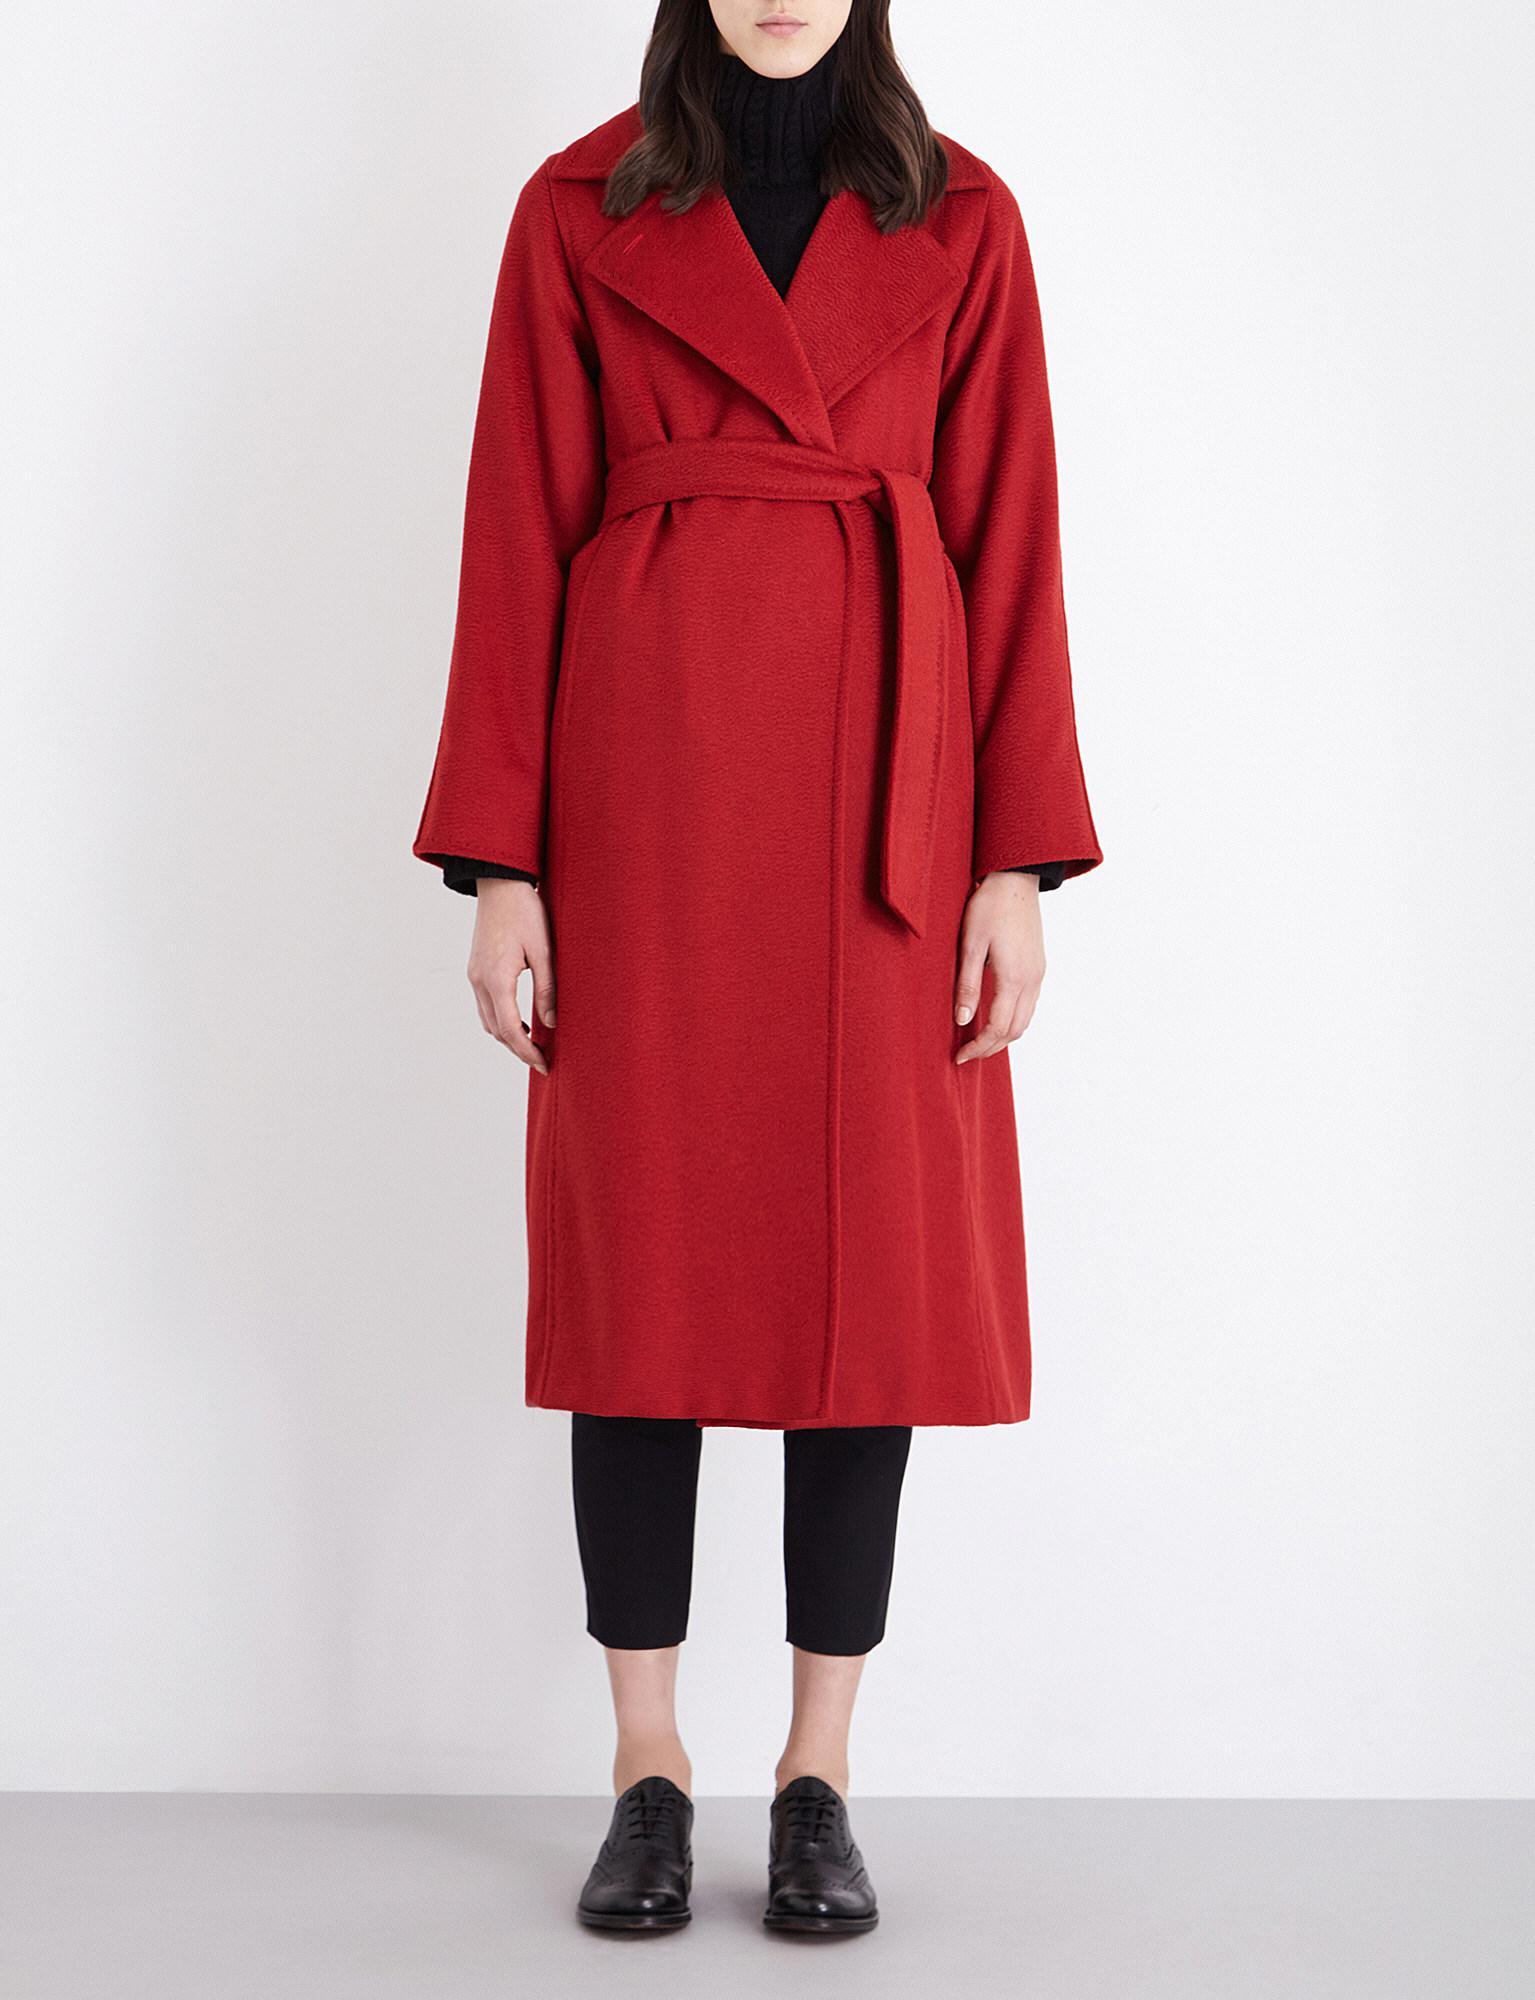 c031d556a905 Lyst - Max Mara Manuela Camel Hair Coat in Red - Save 45%